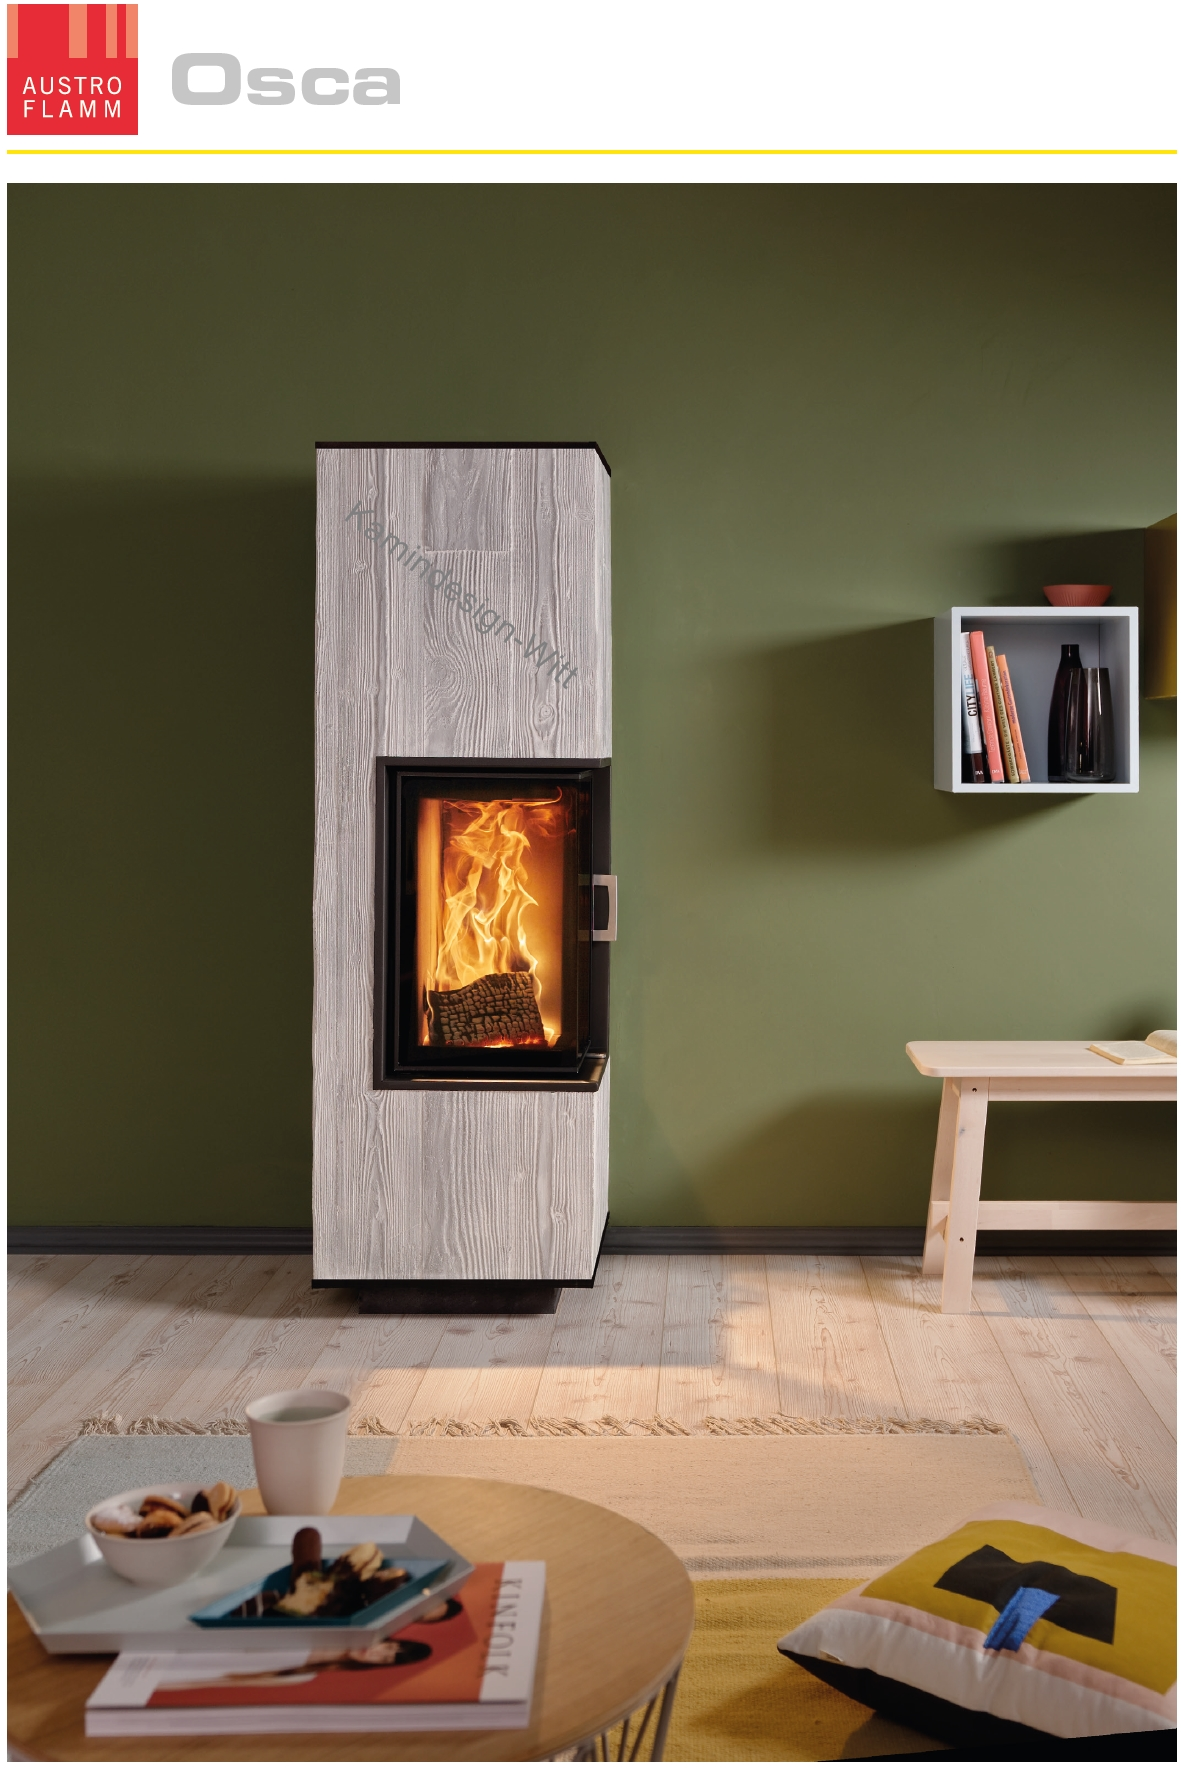 austroflamm kamin osca 38 kaminbausatz hotline 7 21. Black Bedroom Furniture Sets. Home Design Ideas